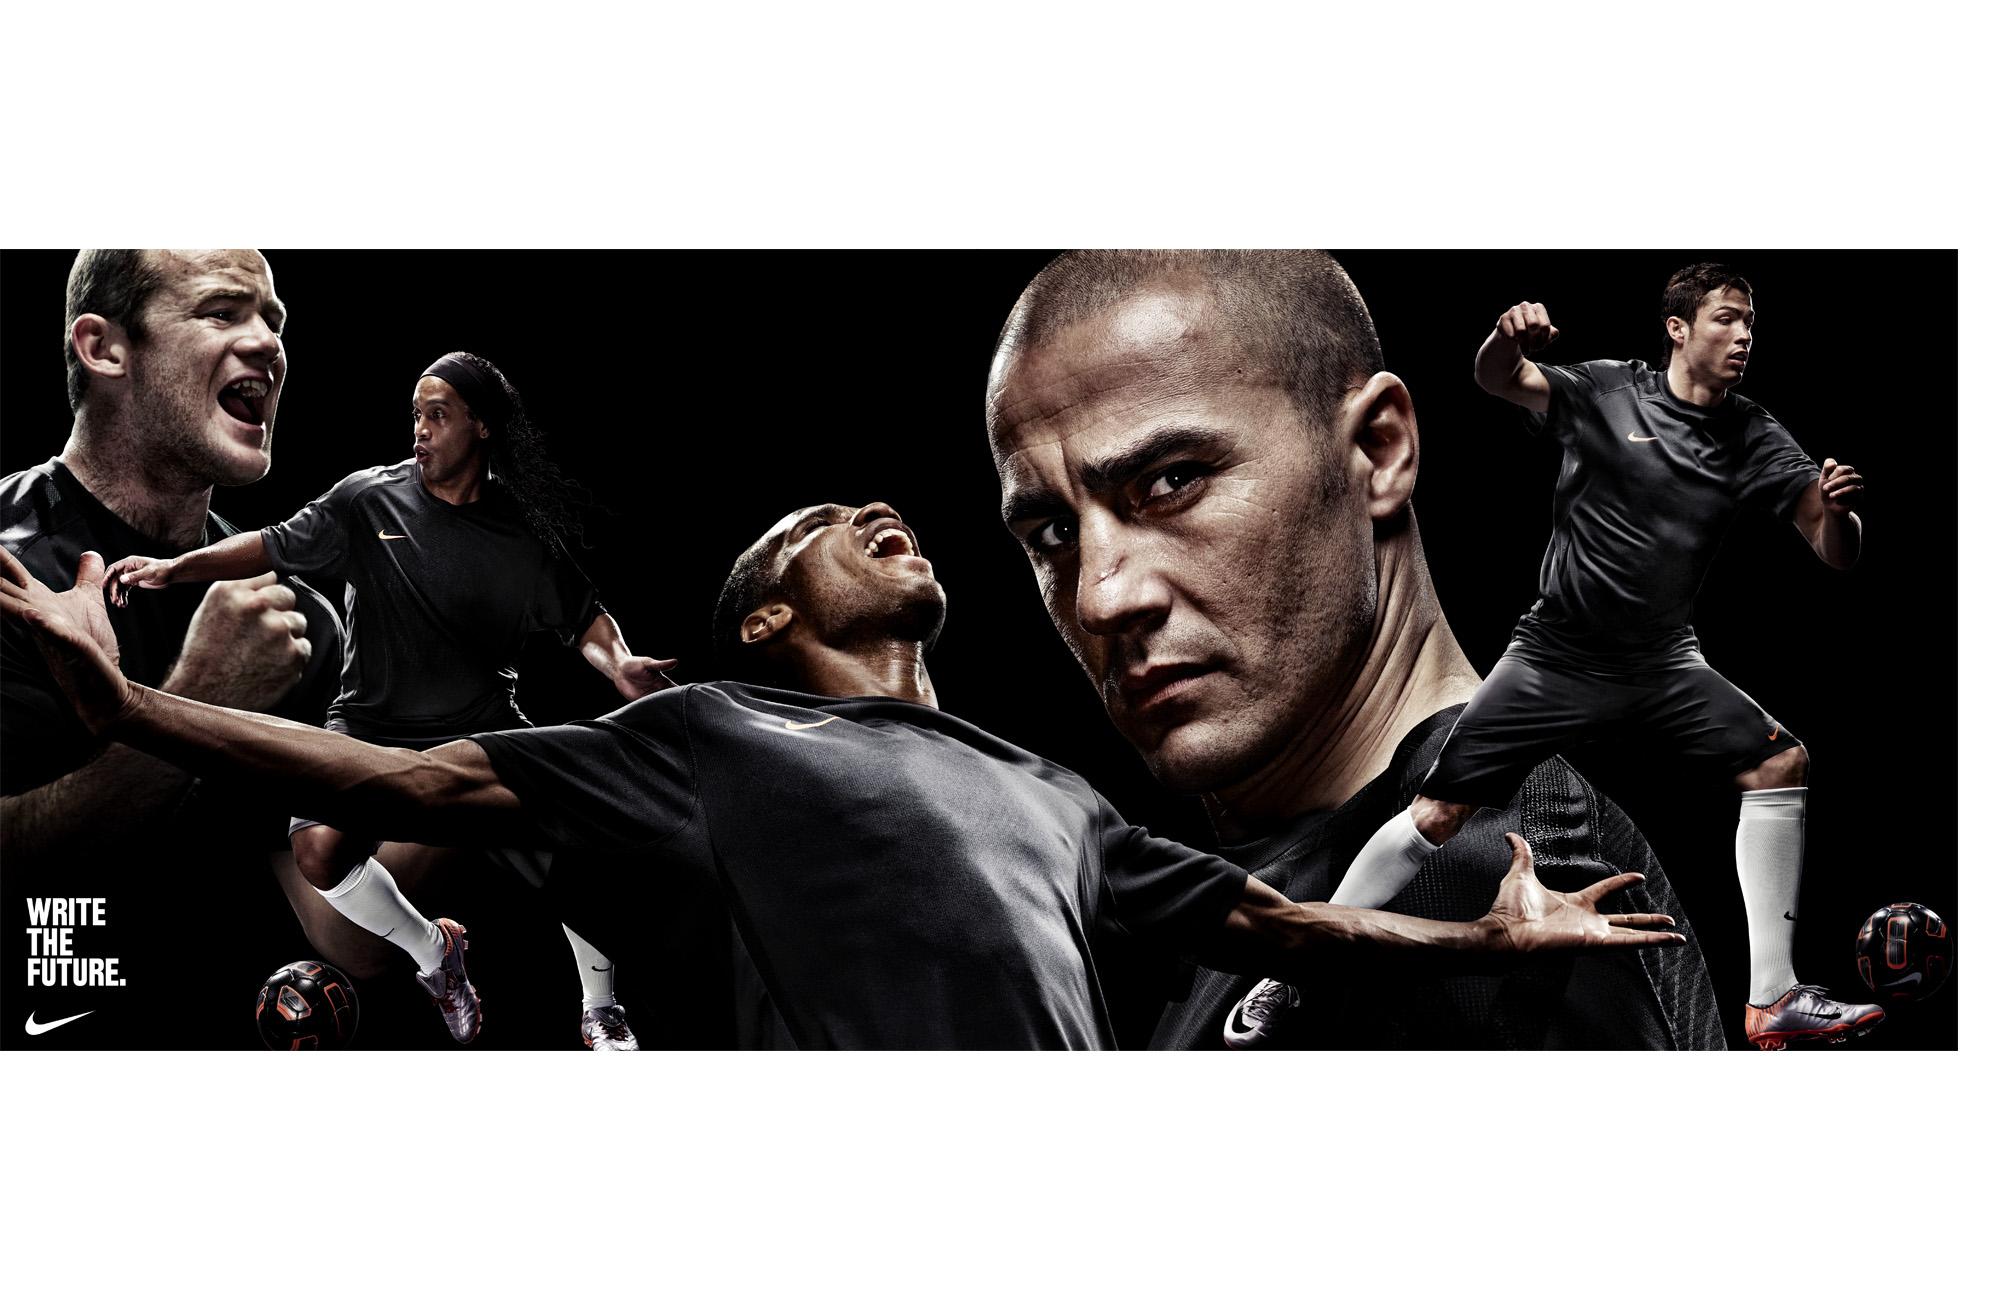 Nike Elite - 2 of 3